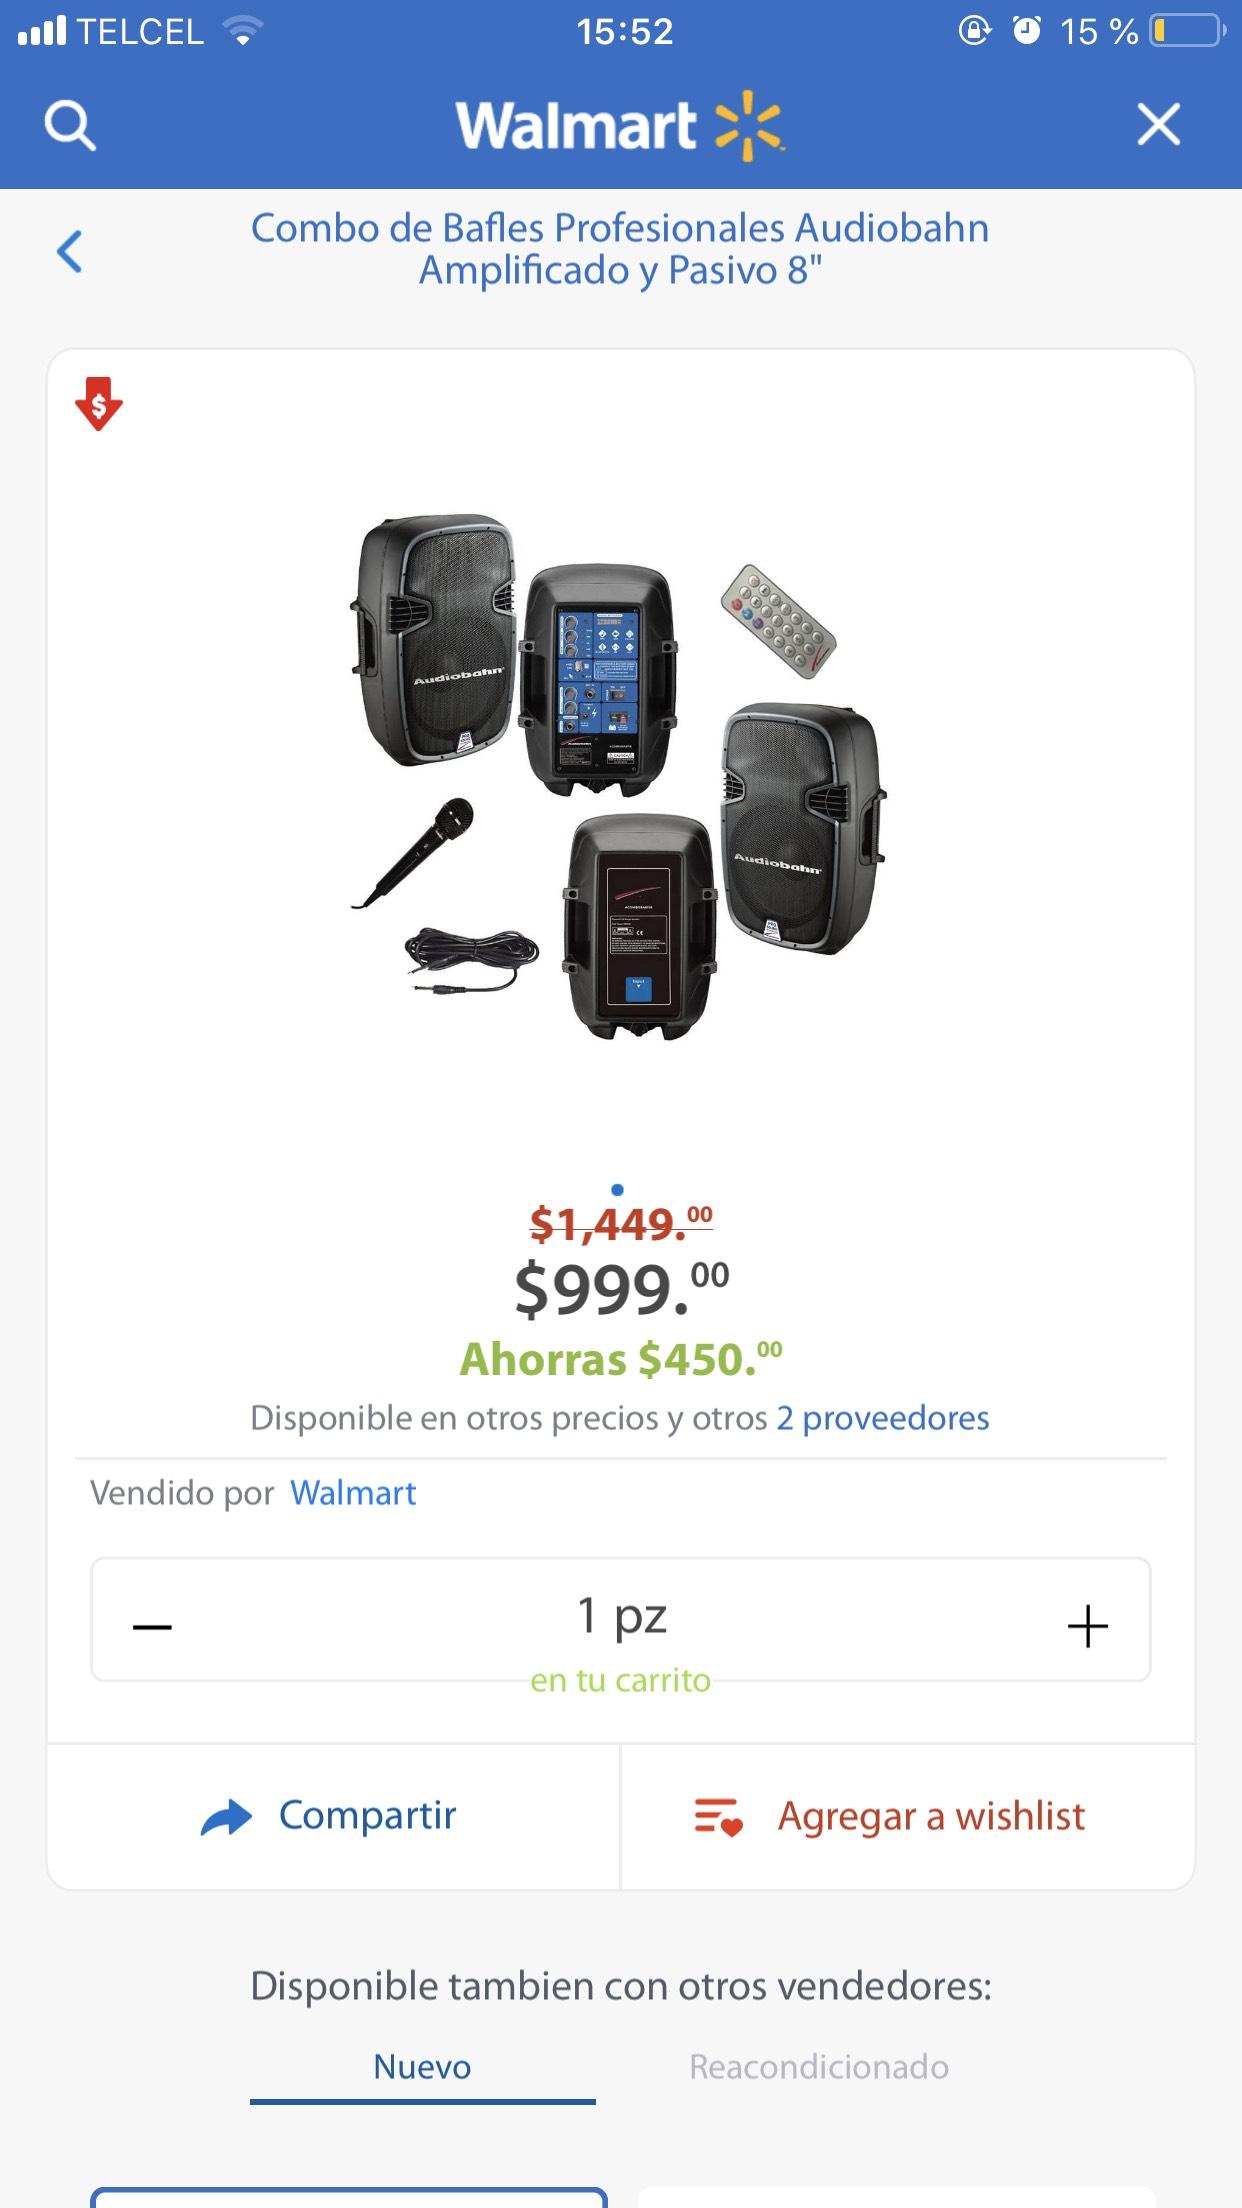 Walmart: Combo de bocinas Audiobahn